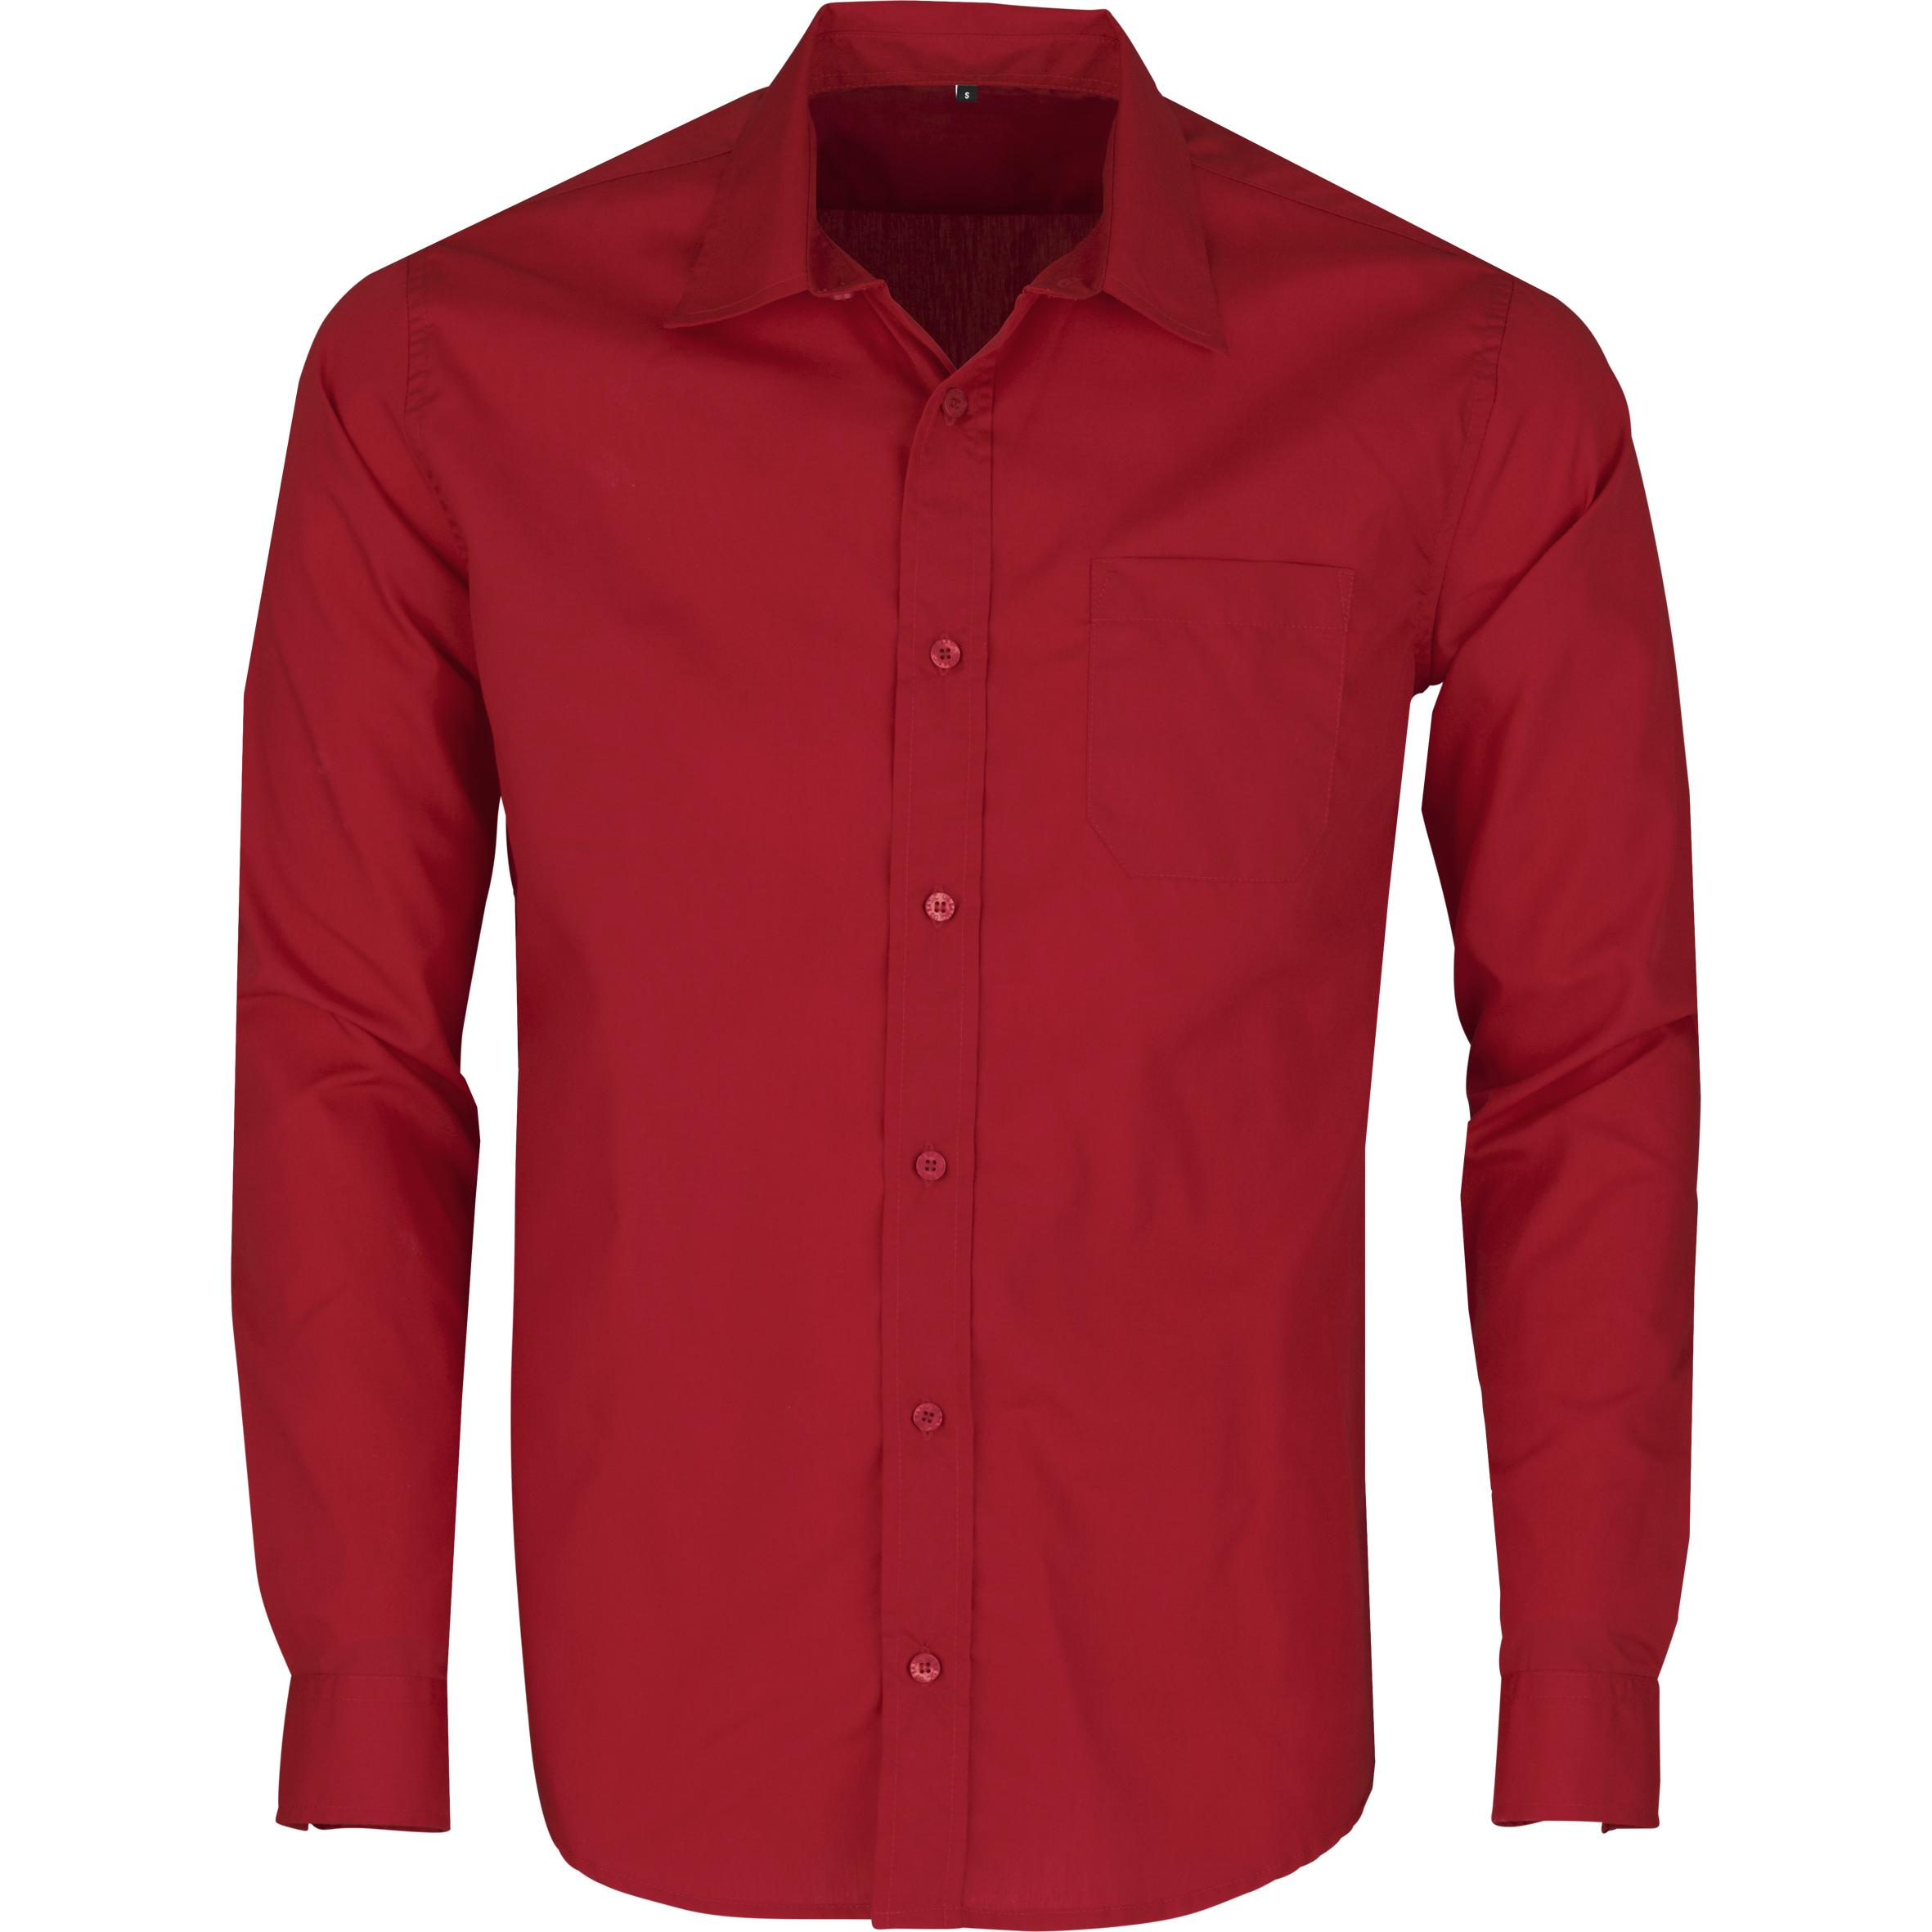 Mens Long Sleeve Kensington Shirt - Red Only